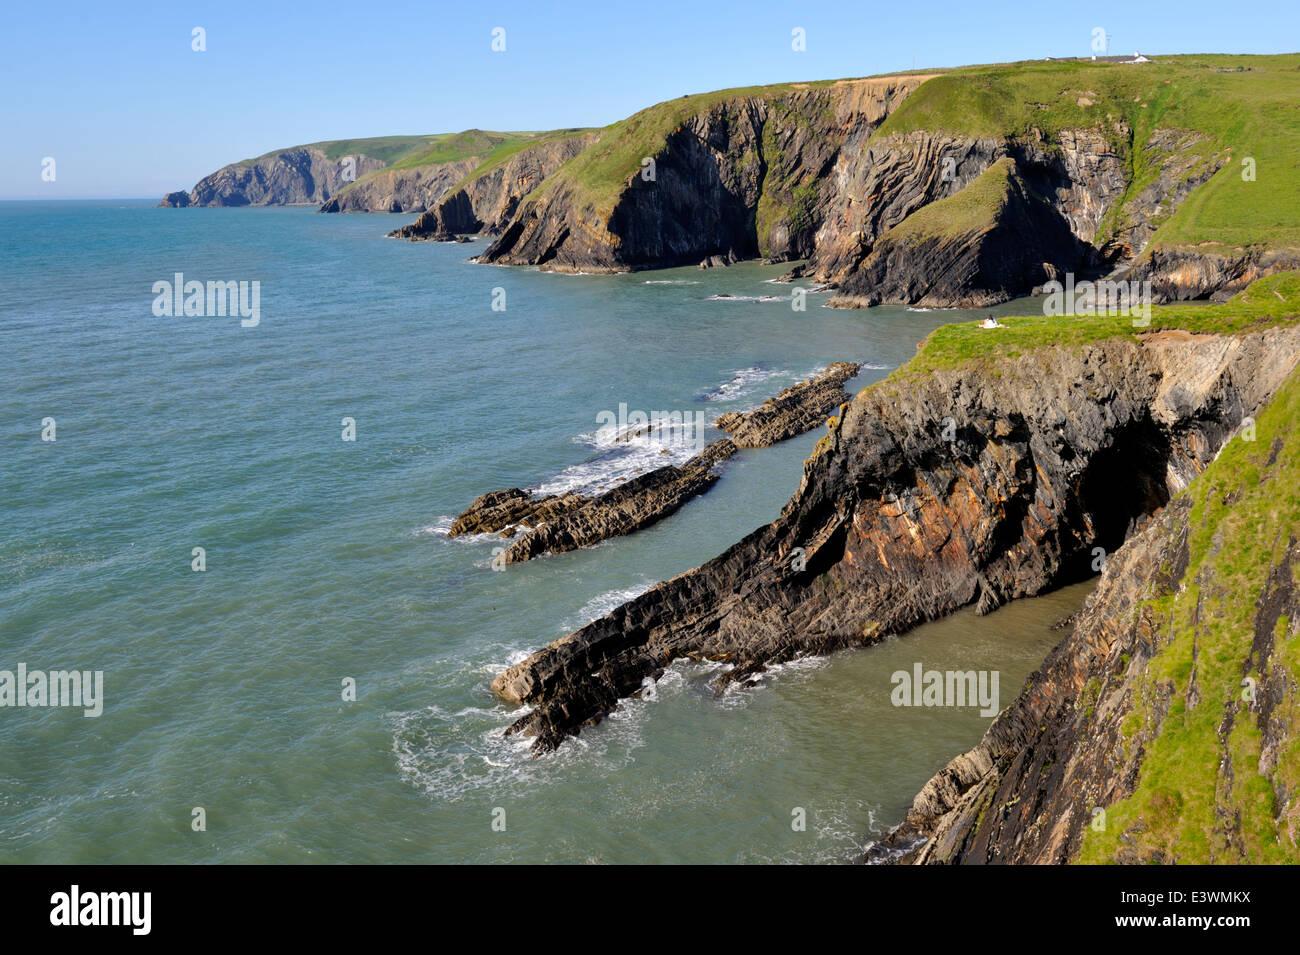 Ceibwr Bay Stock Photos & Ceibwr Bay Stock Images - Alamy